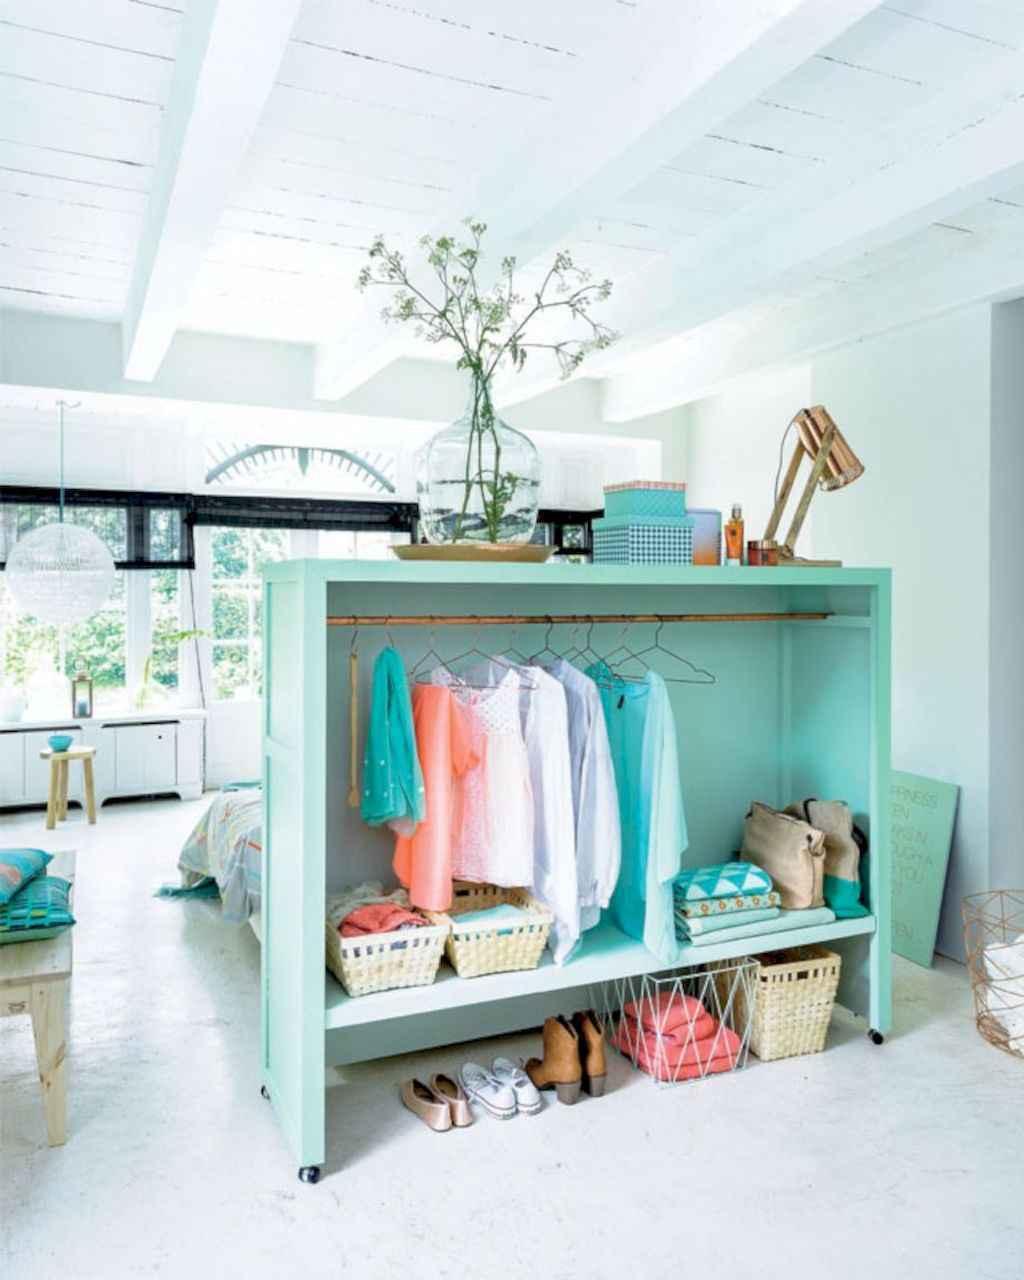 100 Awesome Apartment Studio Storage Ideas Organizing (75)